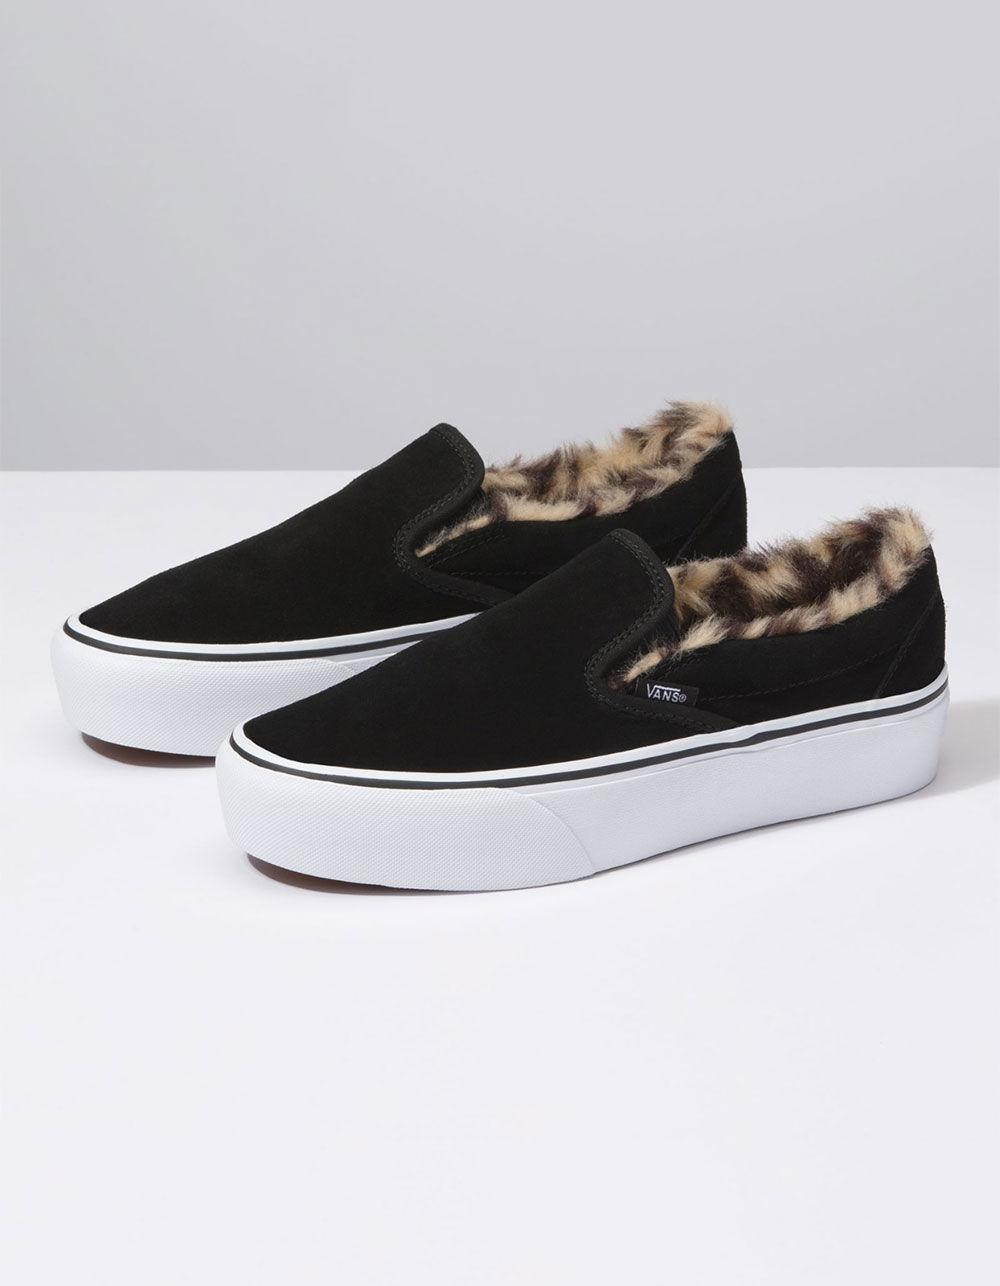 Lyst - Vans Suede Slip-on Platform Fur Black Womens Shoes in Black be8013787e